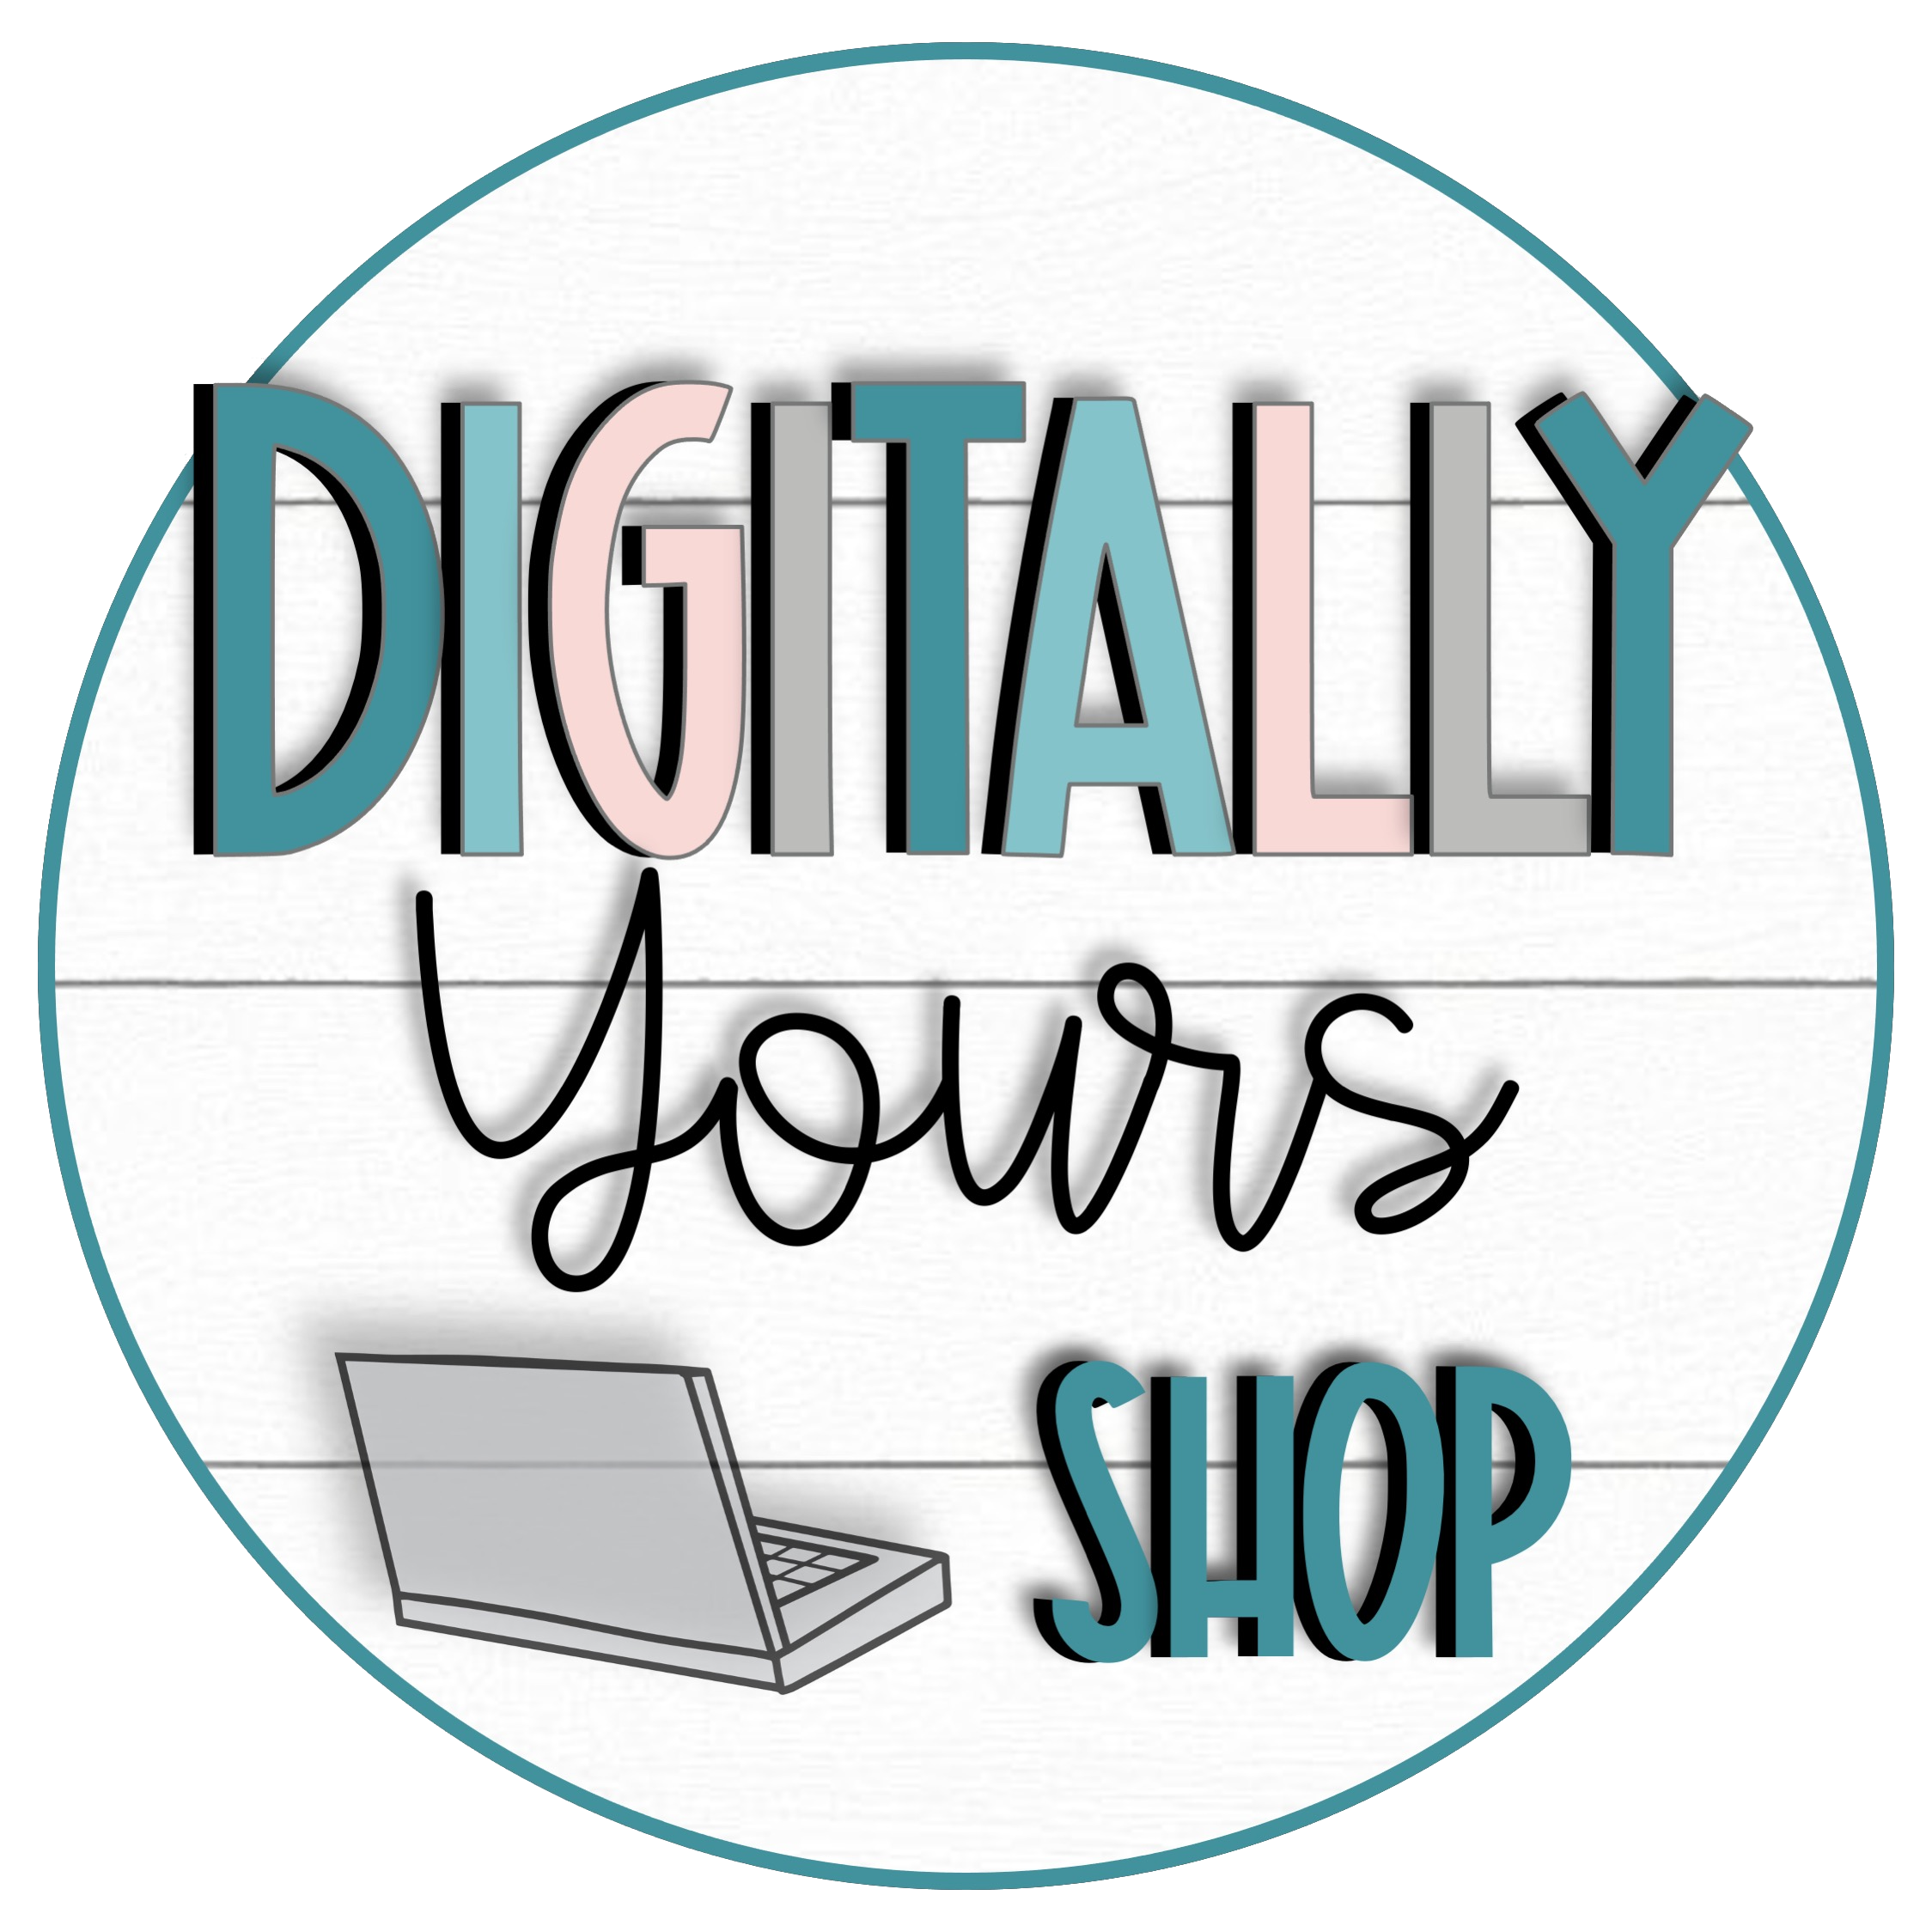 digitally-yours-shop-professional-transparentlogo2.png